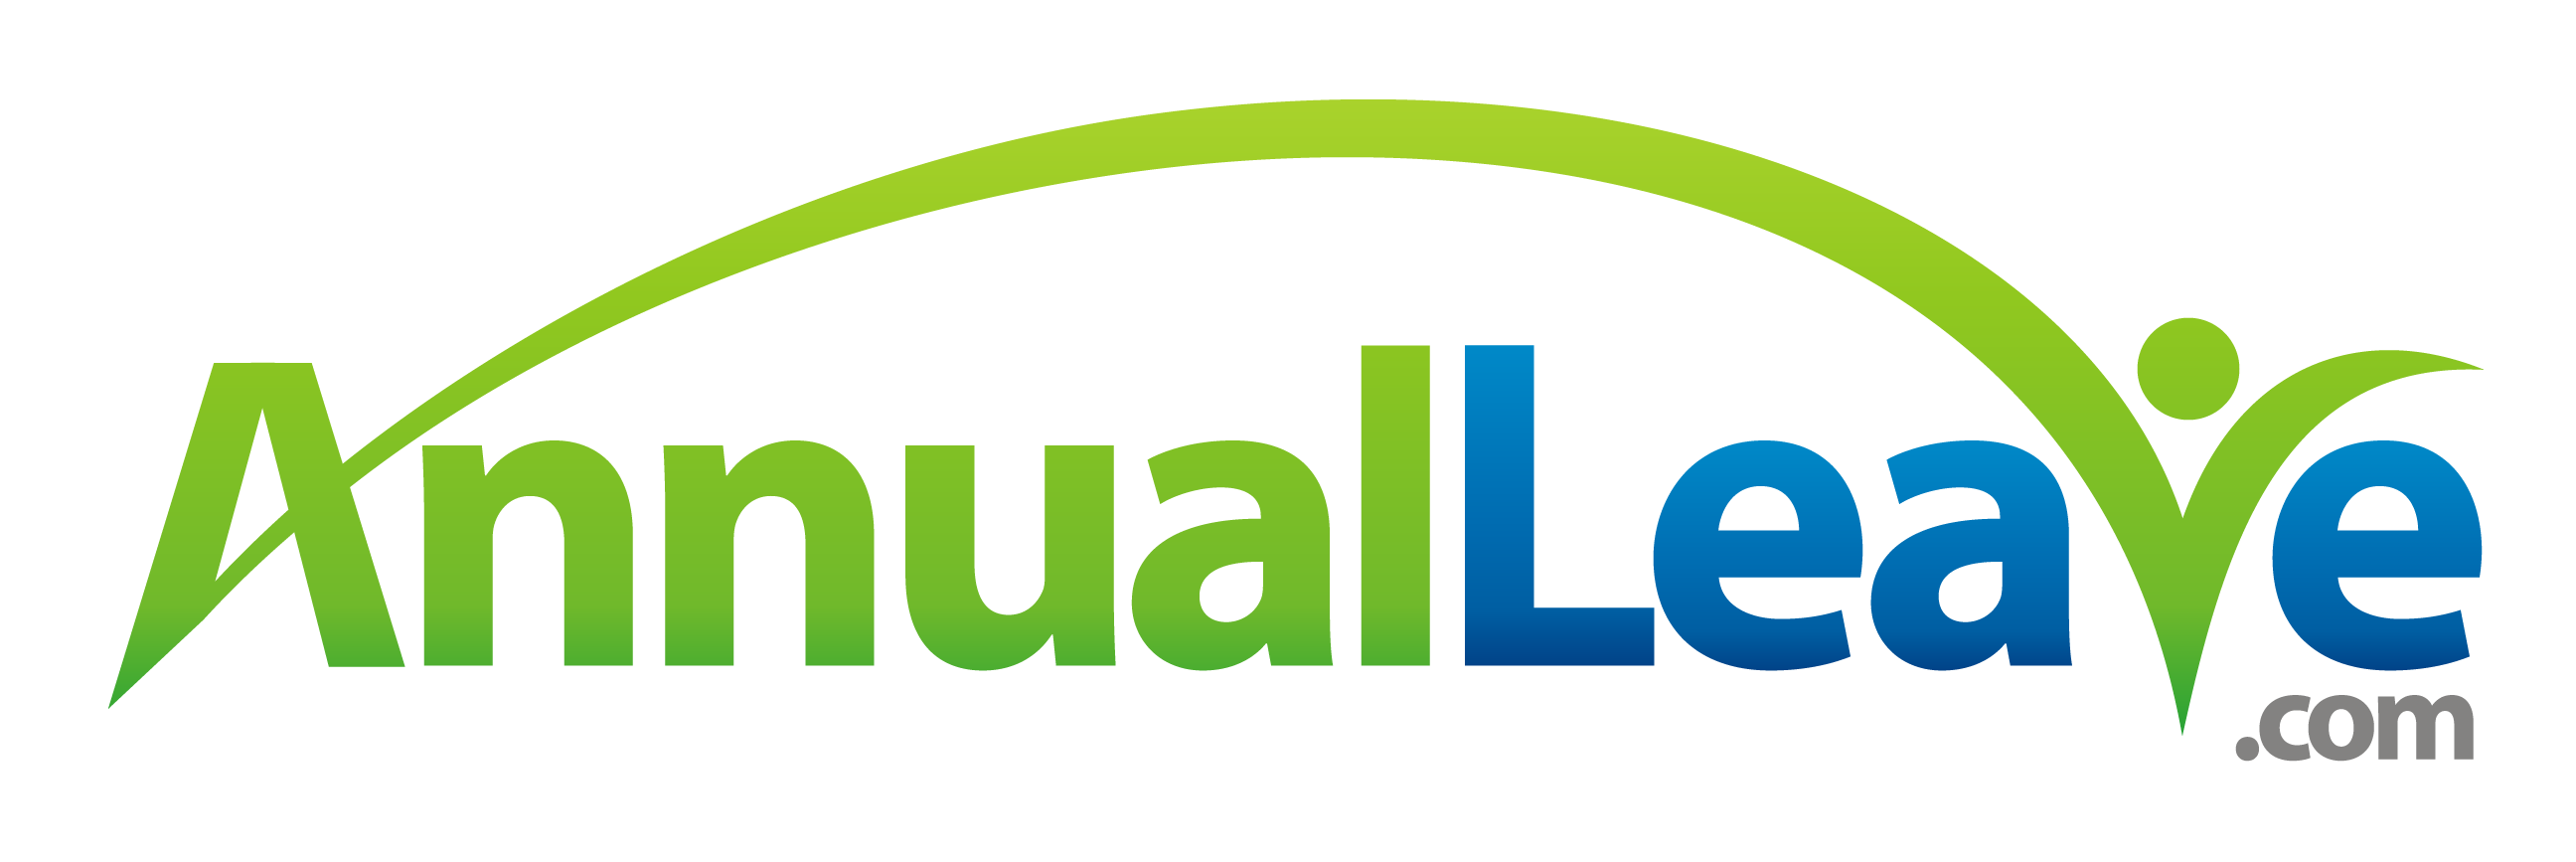 AnnualLeave logo